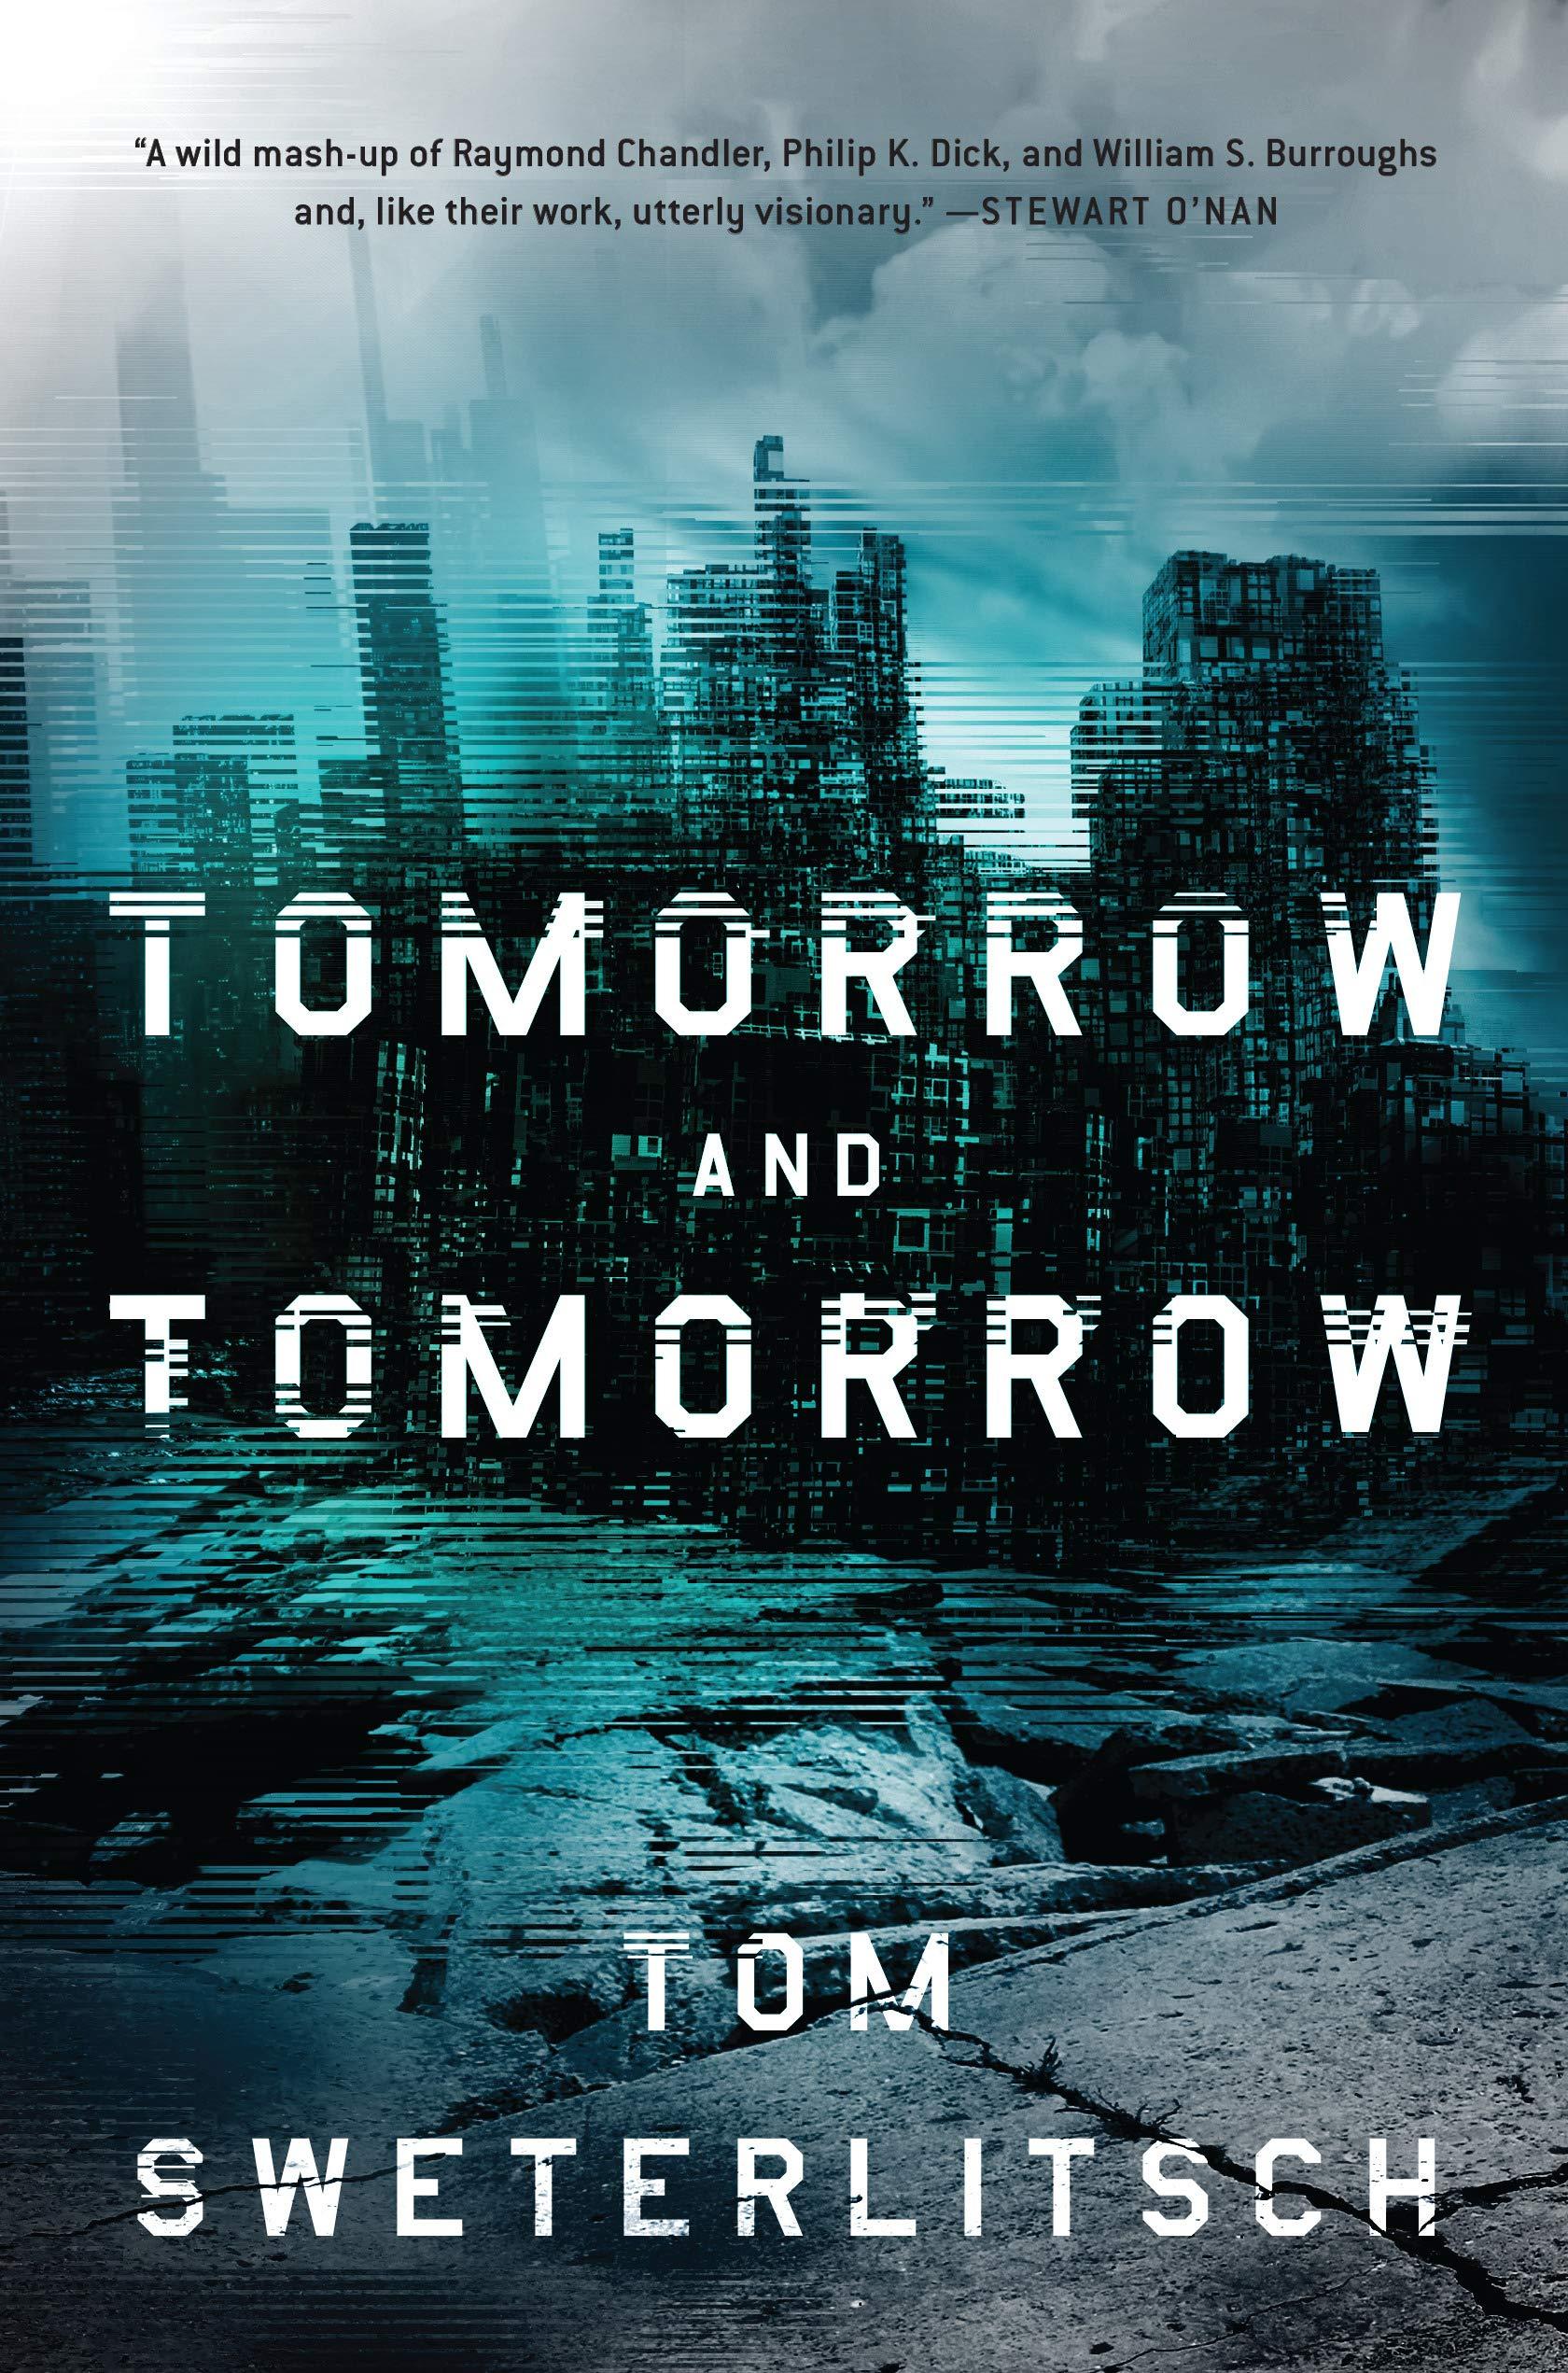 « Tomorrow and Tomorrrow », de Tom Sweterlitsch